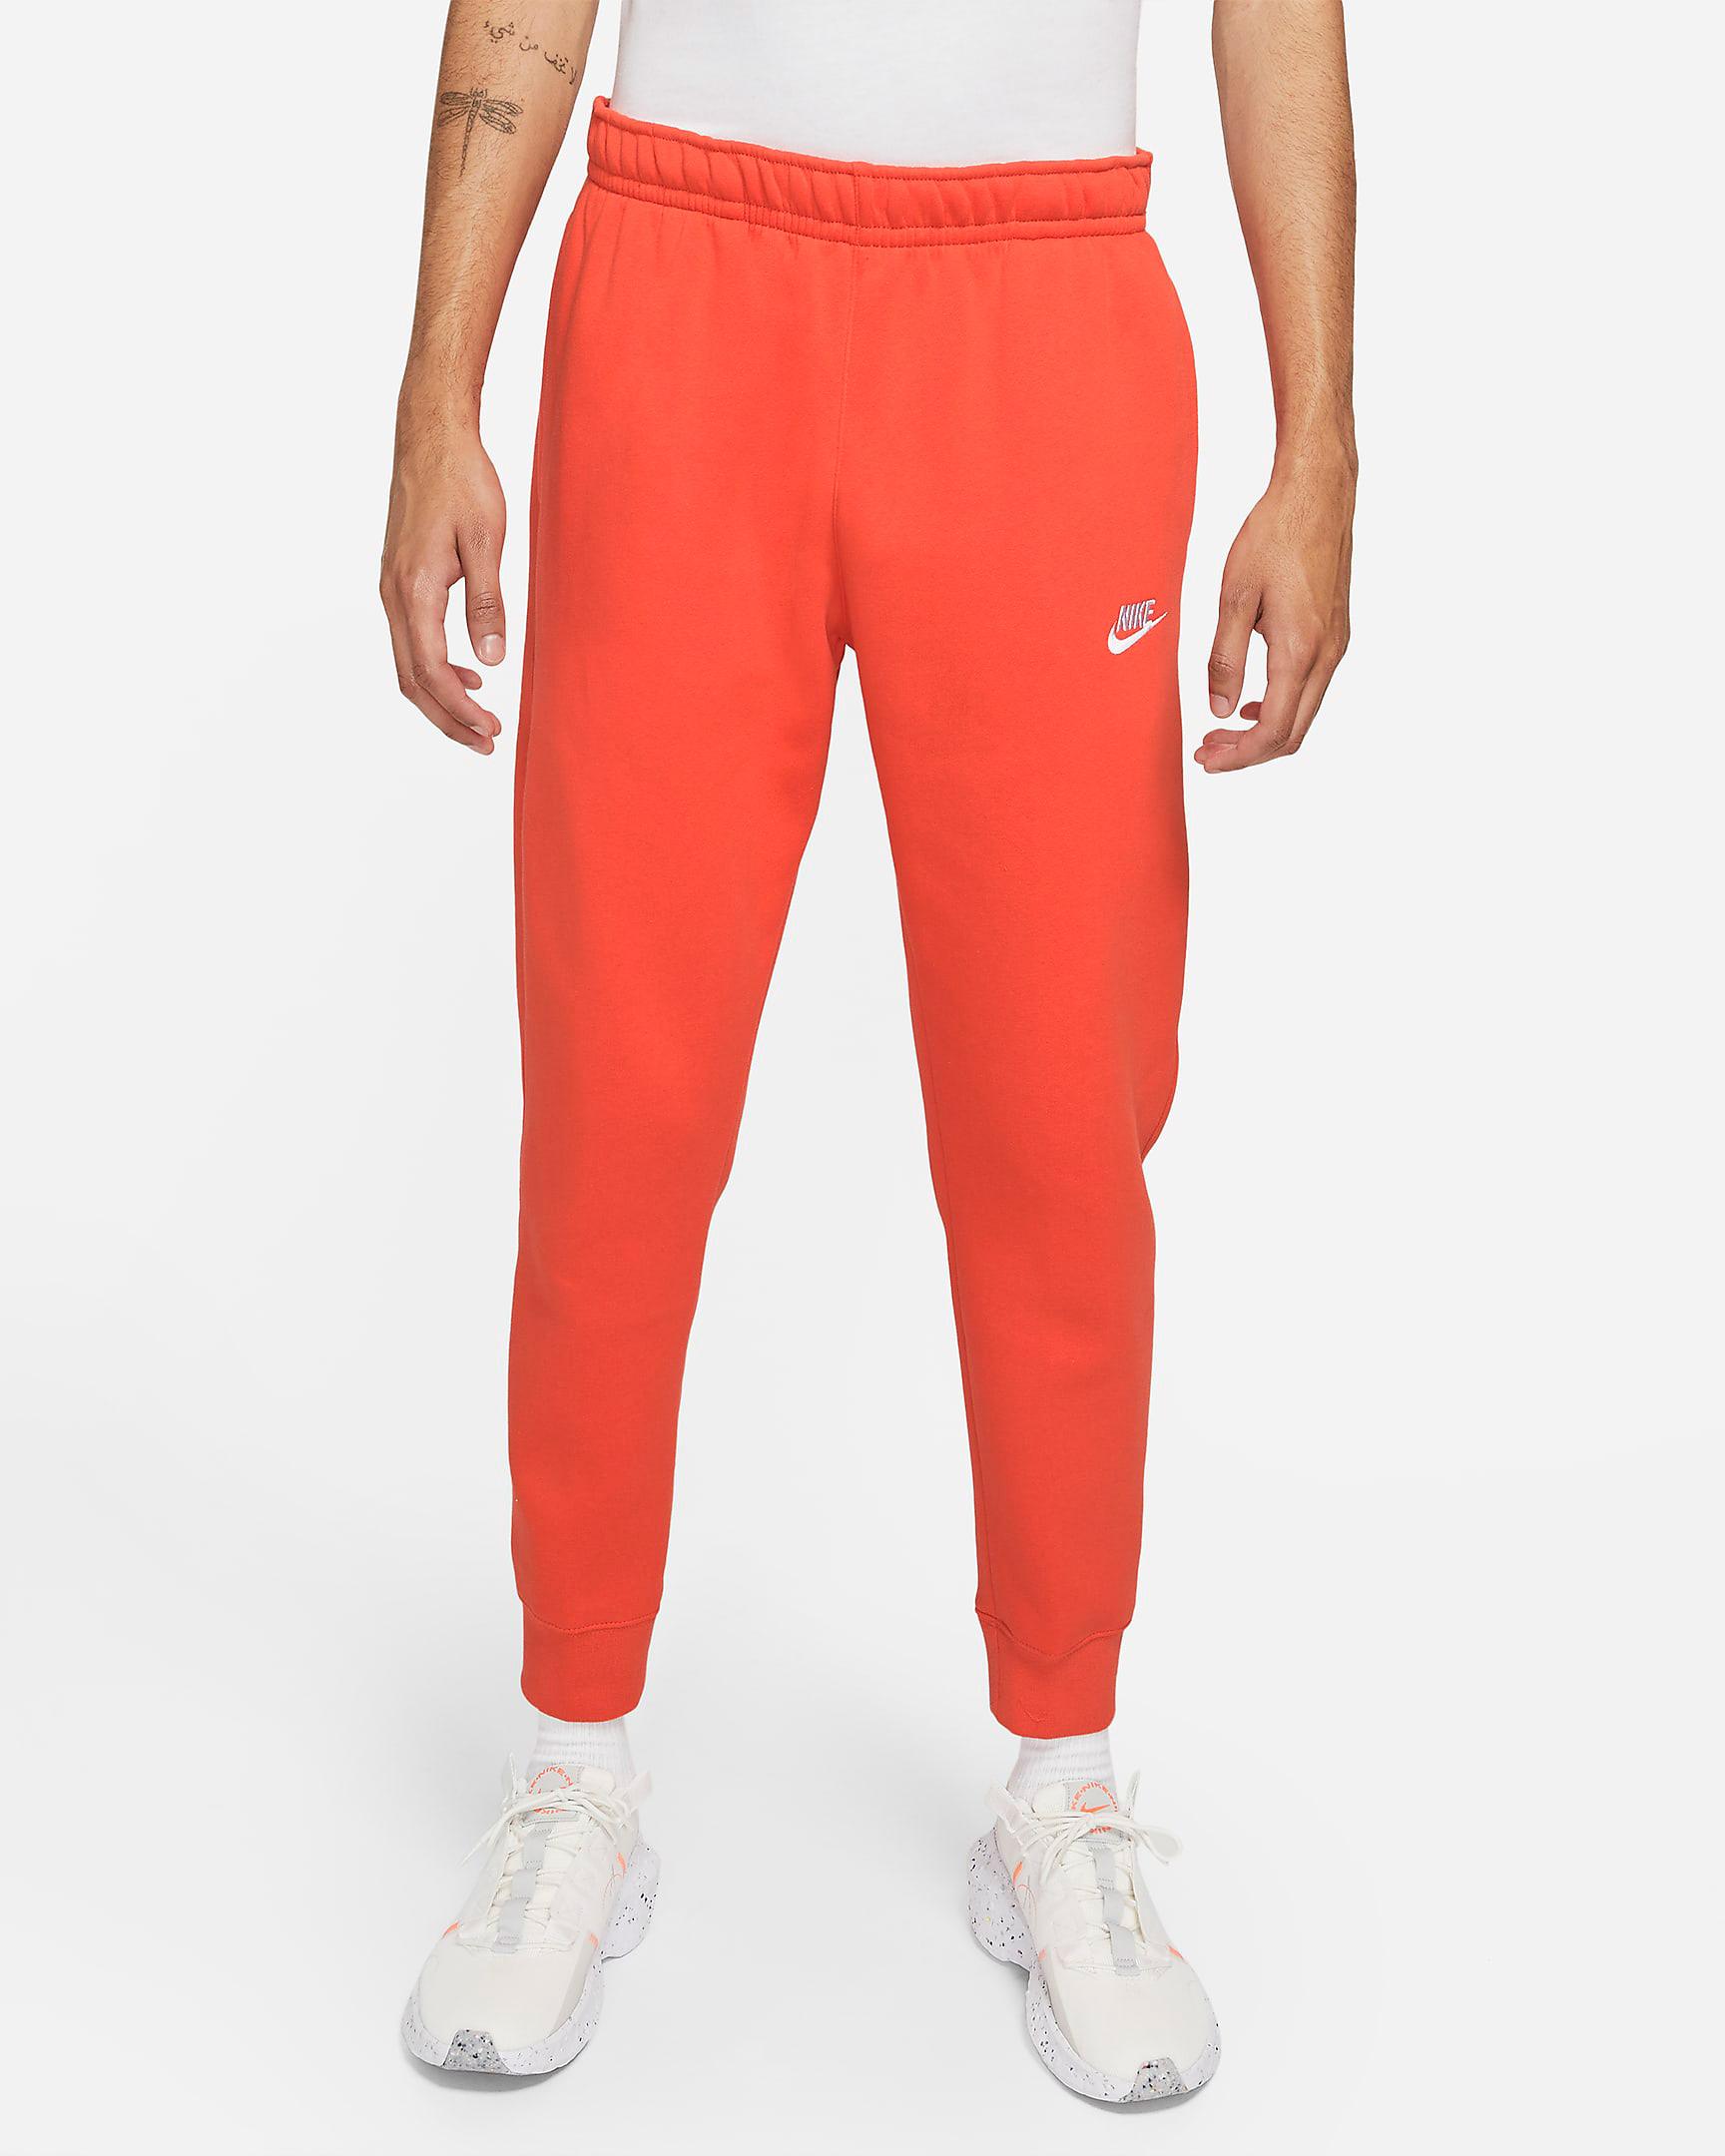 nike-club-fleece-orange-jogger-pants-1